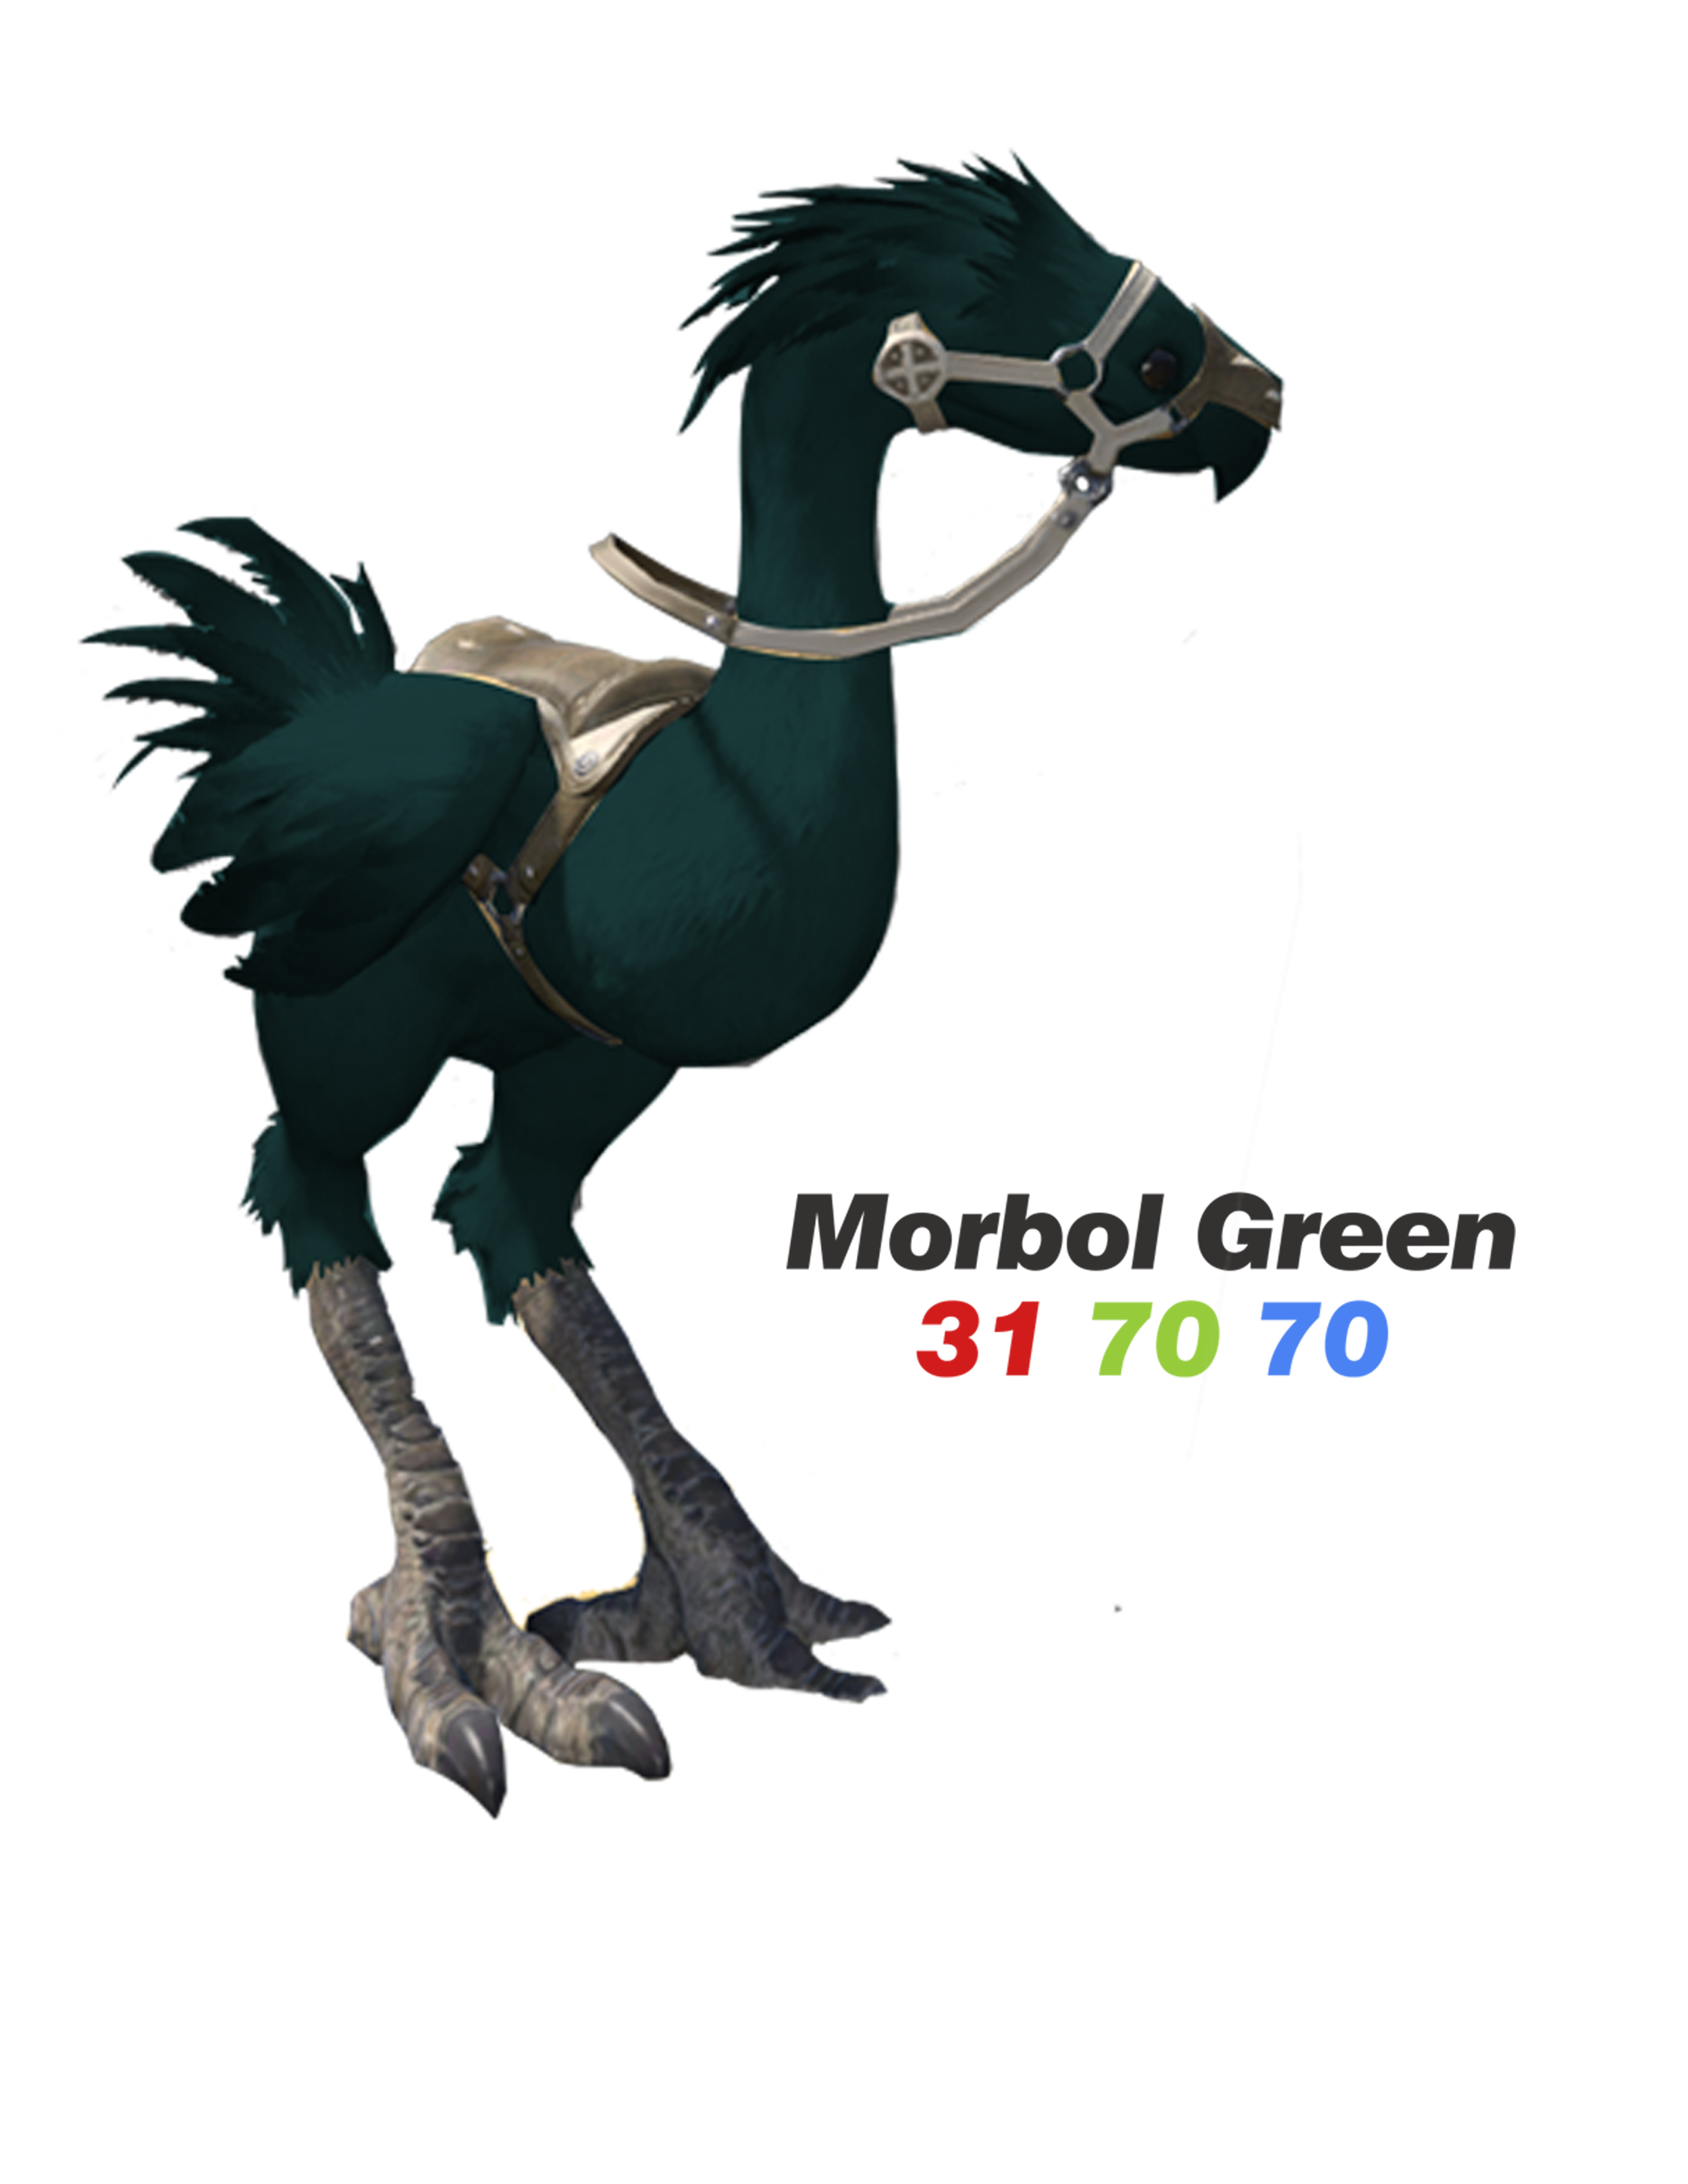 017Morbol.png